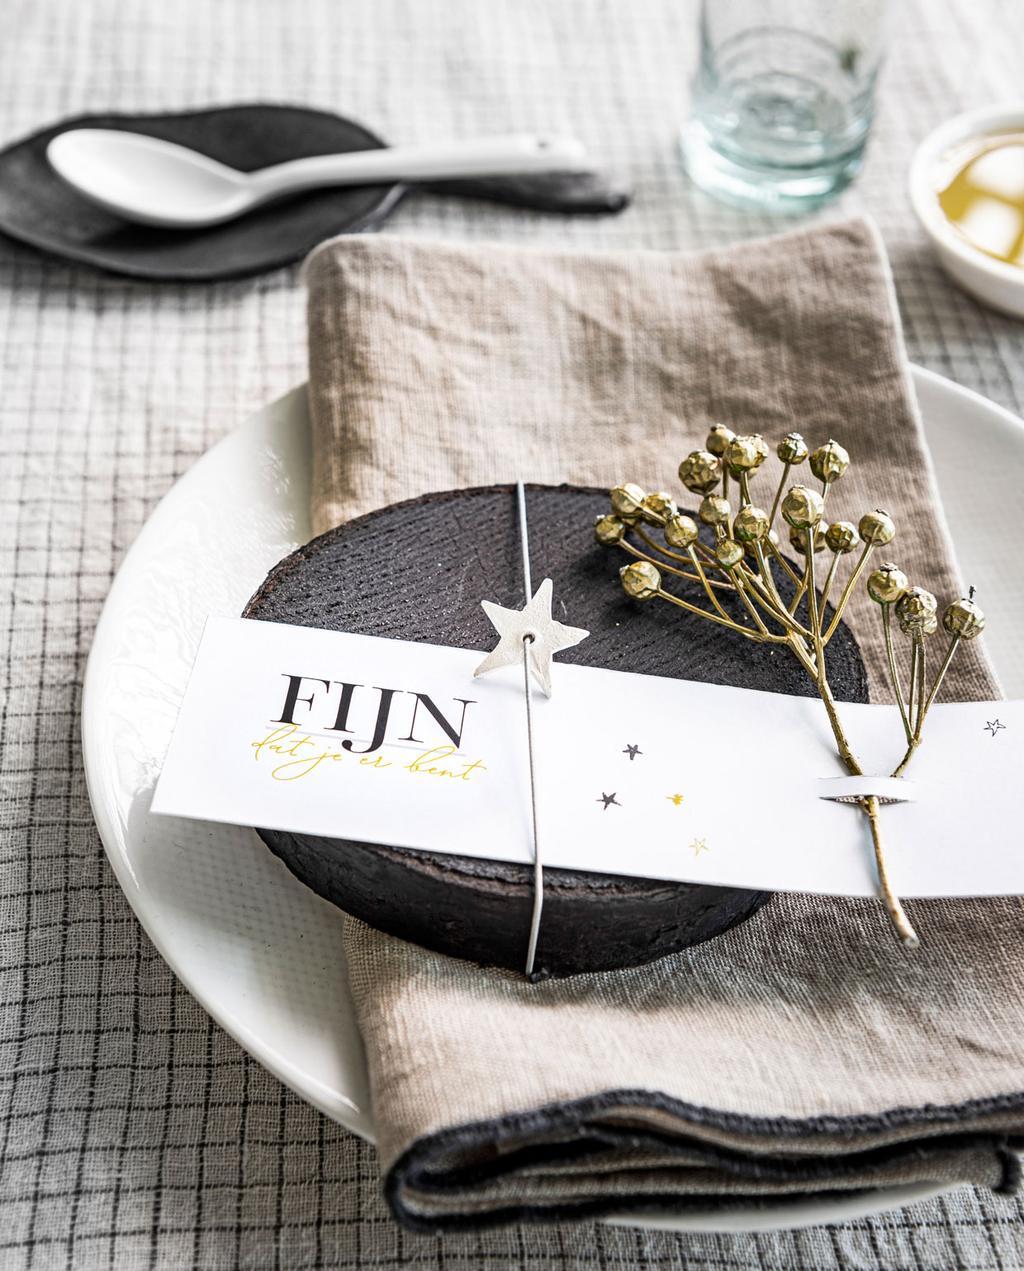 vtwonen | DIY feestprints welkomskaartje feestdecoratie